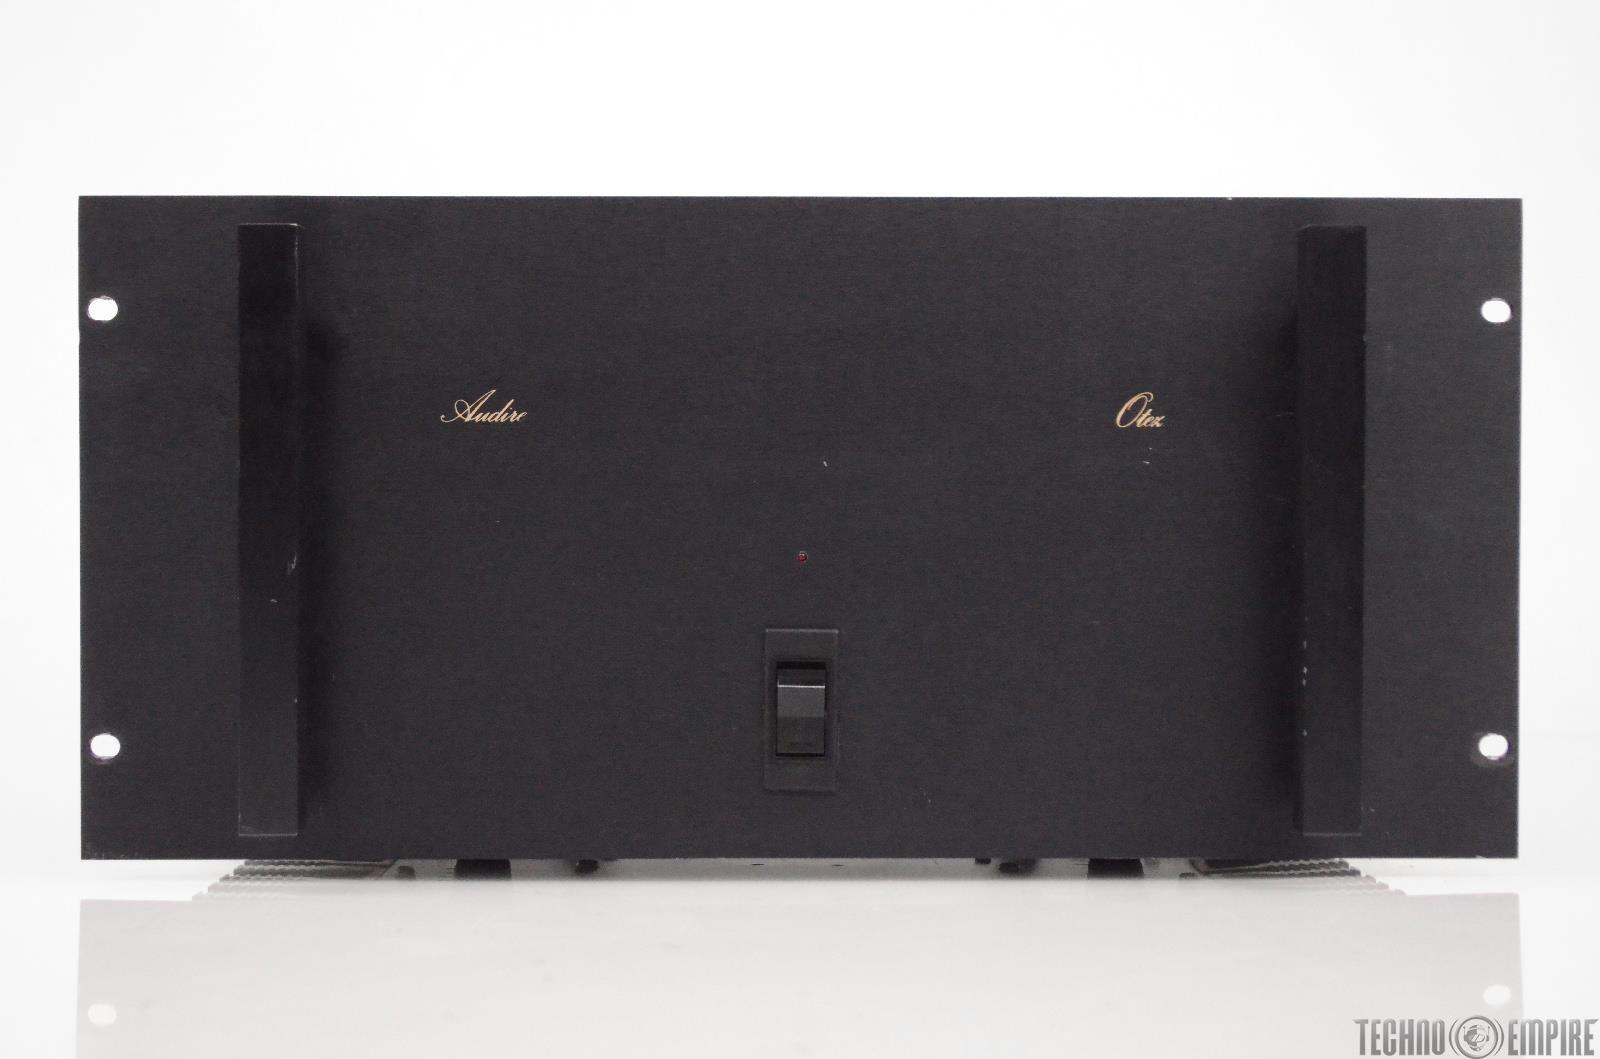 Audire Otez Stereo Power Amplifier 1750 Watt 2 Channel Audiophile Amp #31157